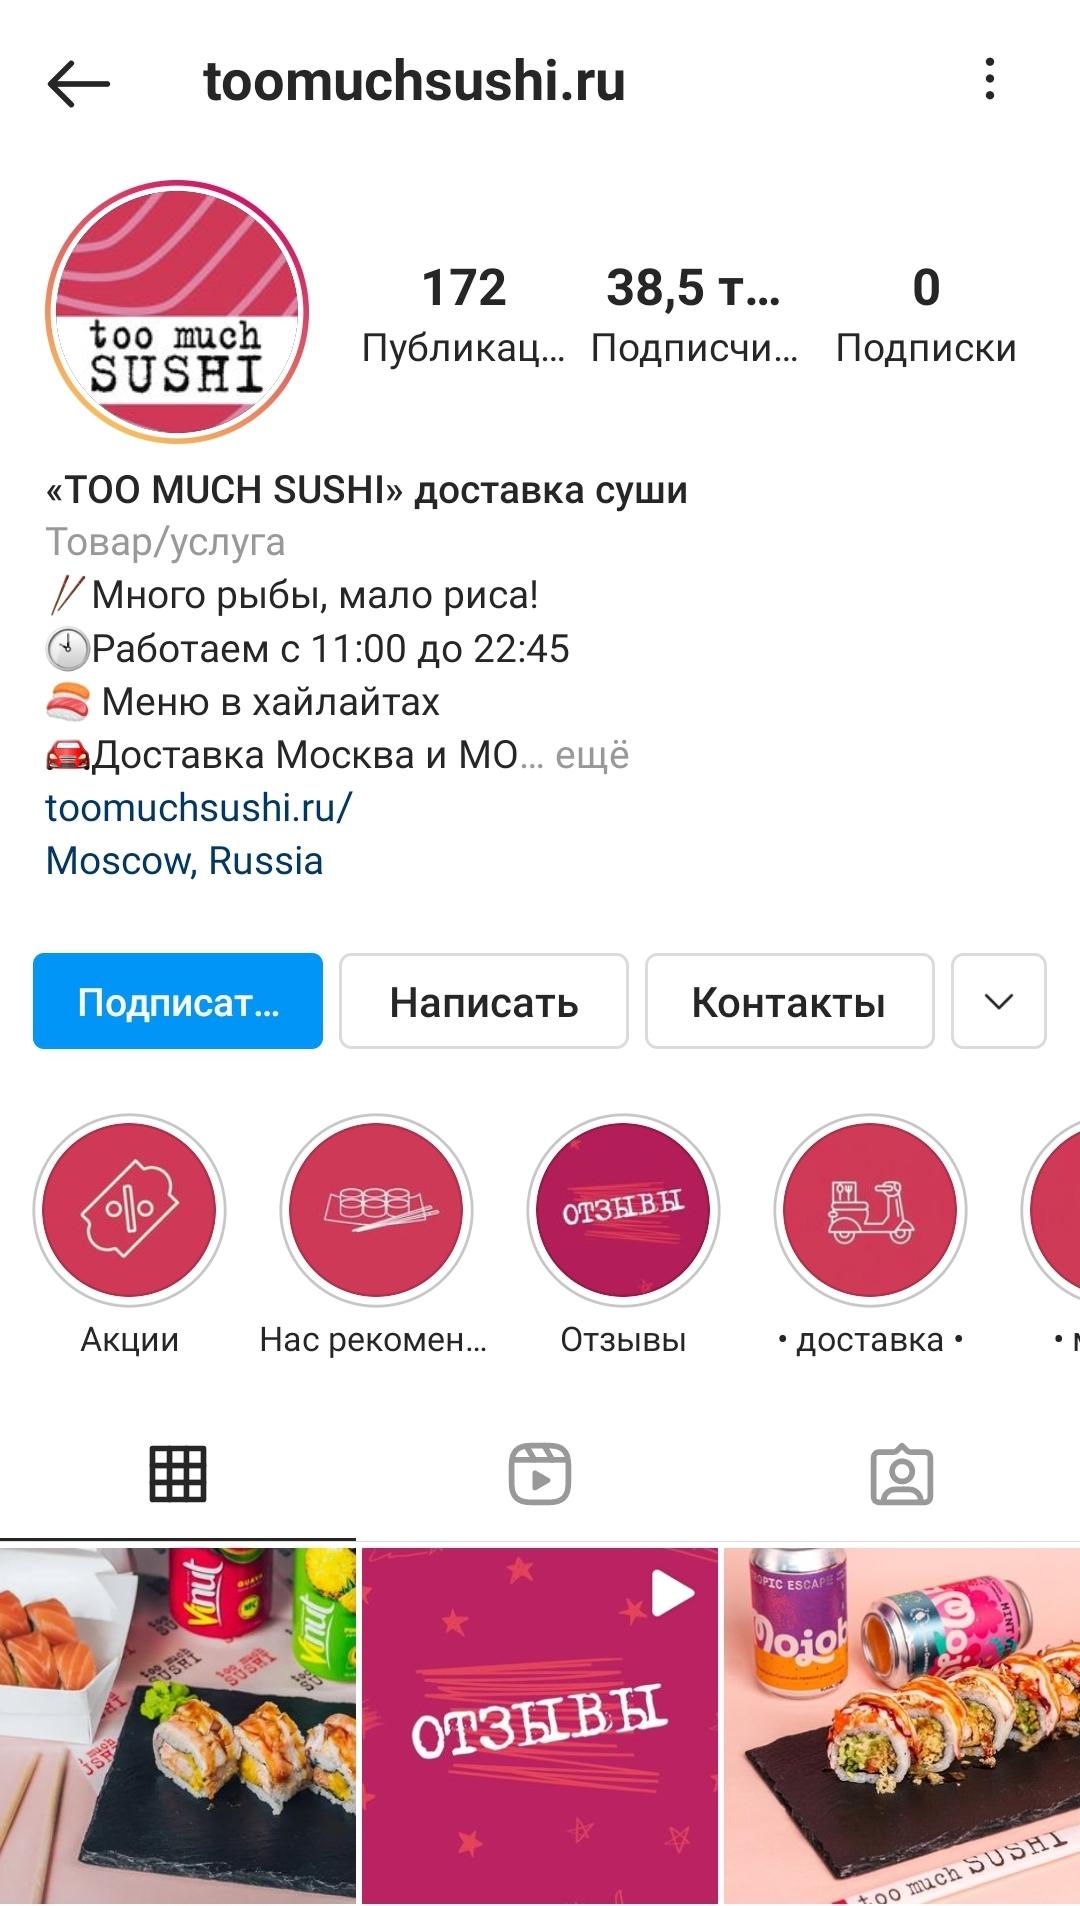 TooMuchSushi - Mayco Agency